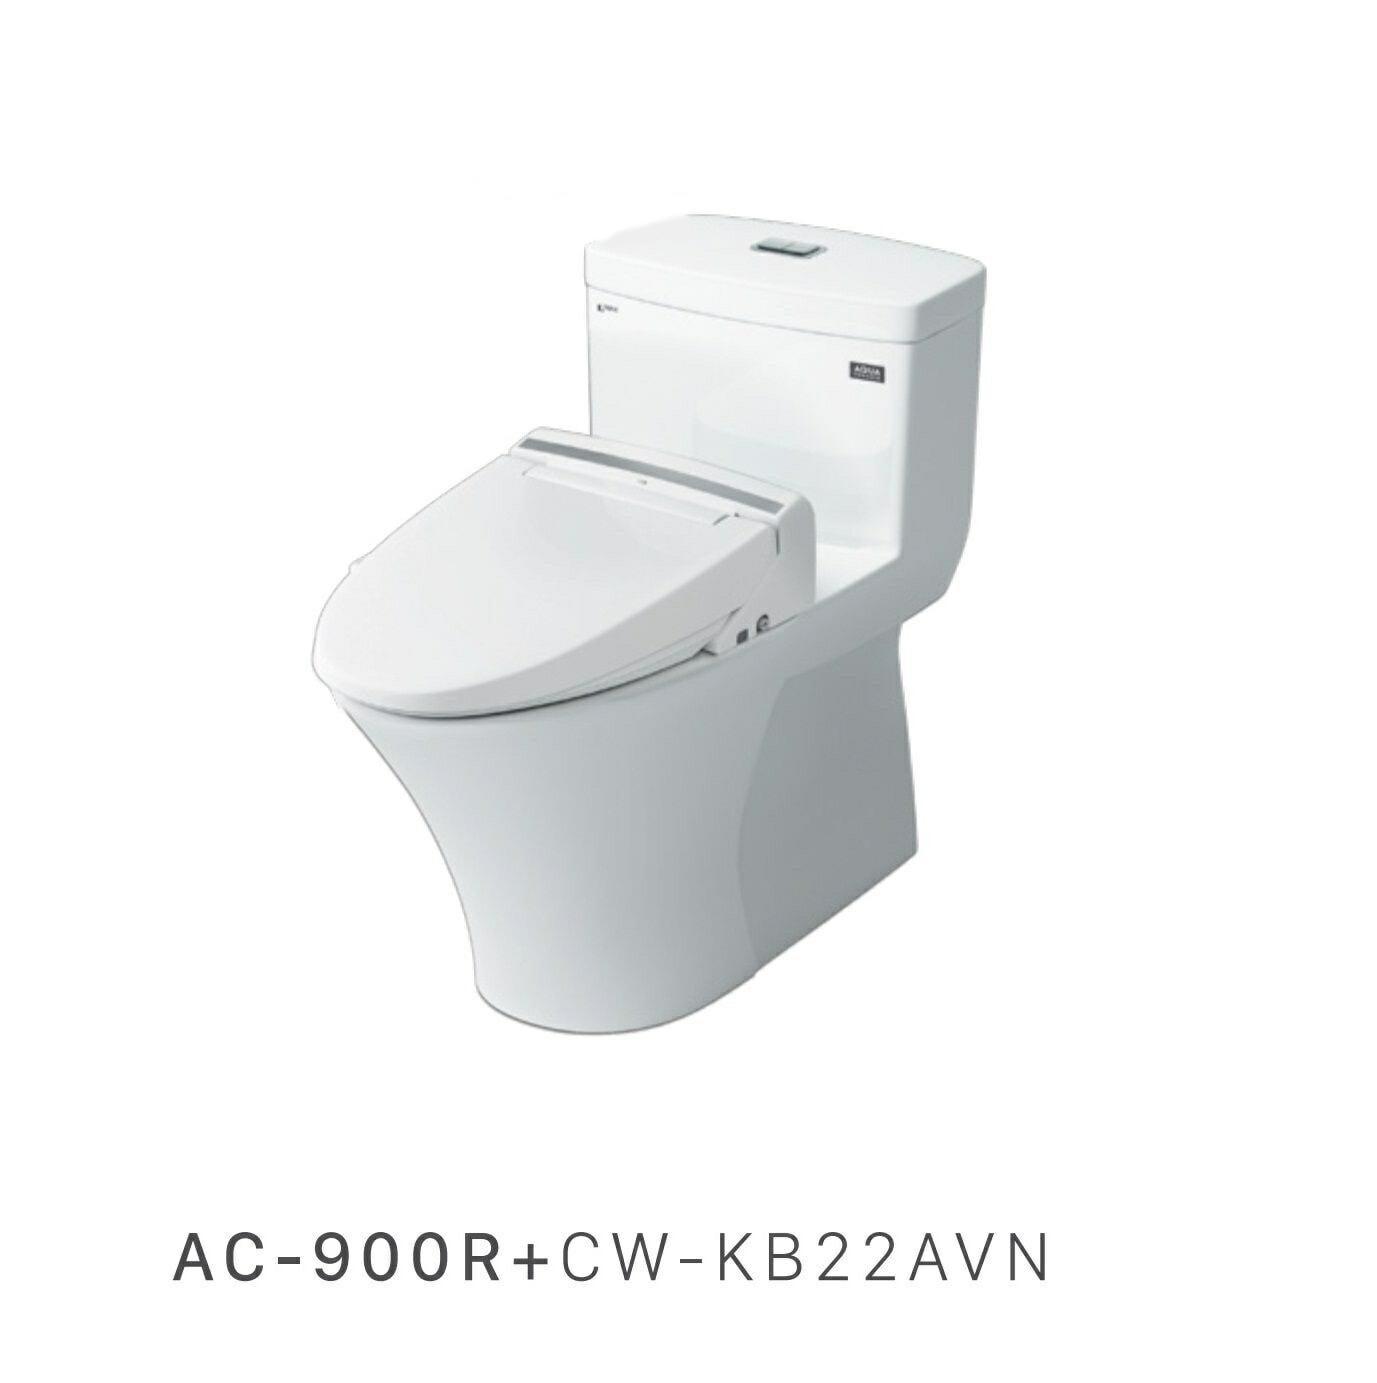 Bồn cầu Inax AC-900R+CW-KB22AVN